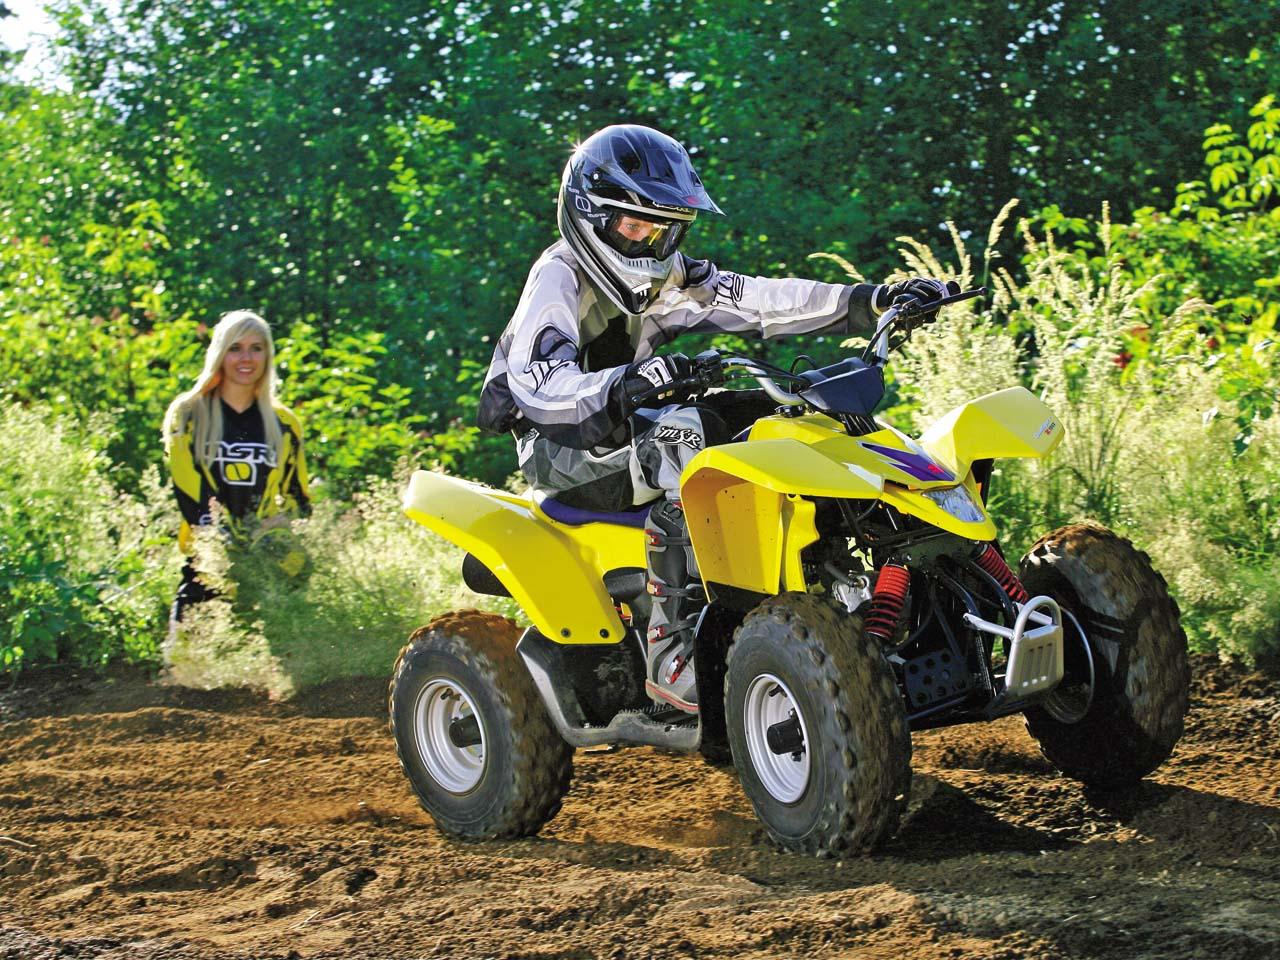 hight resolution of 2011 suzuki quadsport z90 yellow front right riding